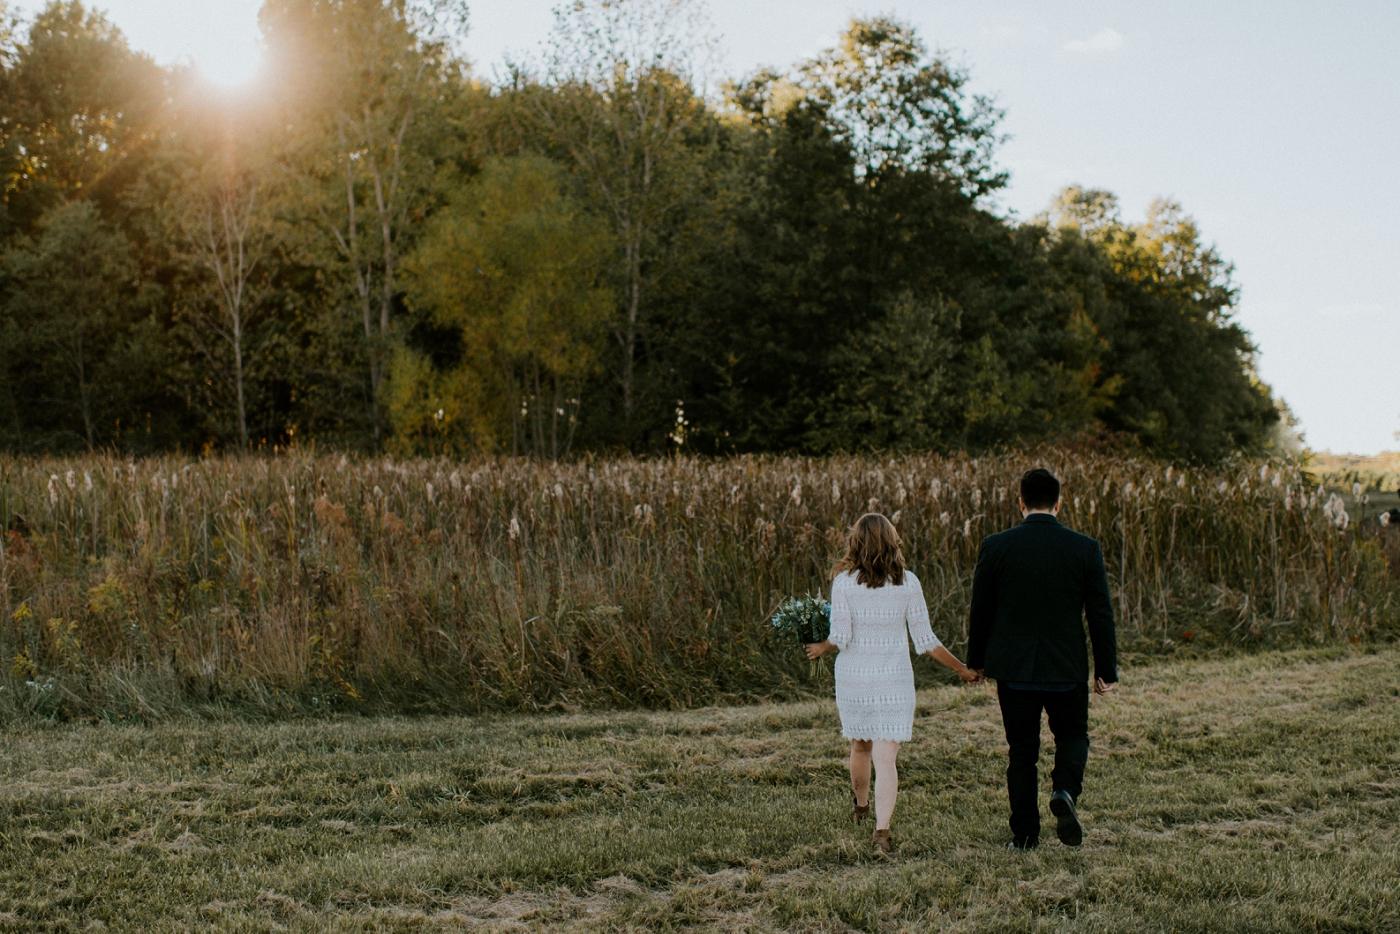 Wildflower-Field-Elopement-Vow-Renewal_Lisa+Chad_MJPHOTO-38.JPG